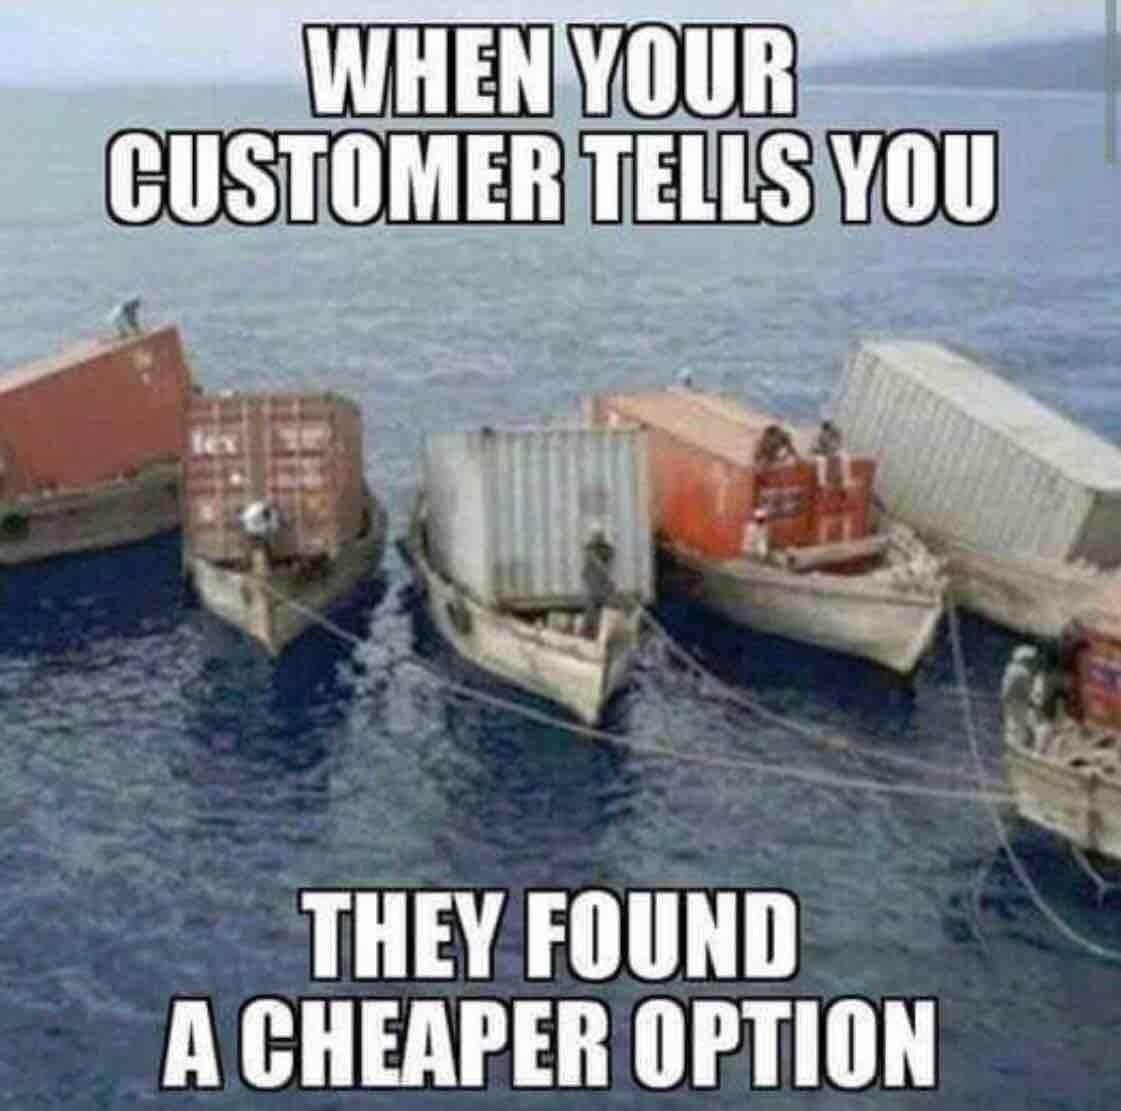 Cand unii clienti spun ca au gasit o solutie mai ieftina